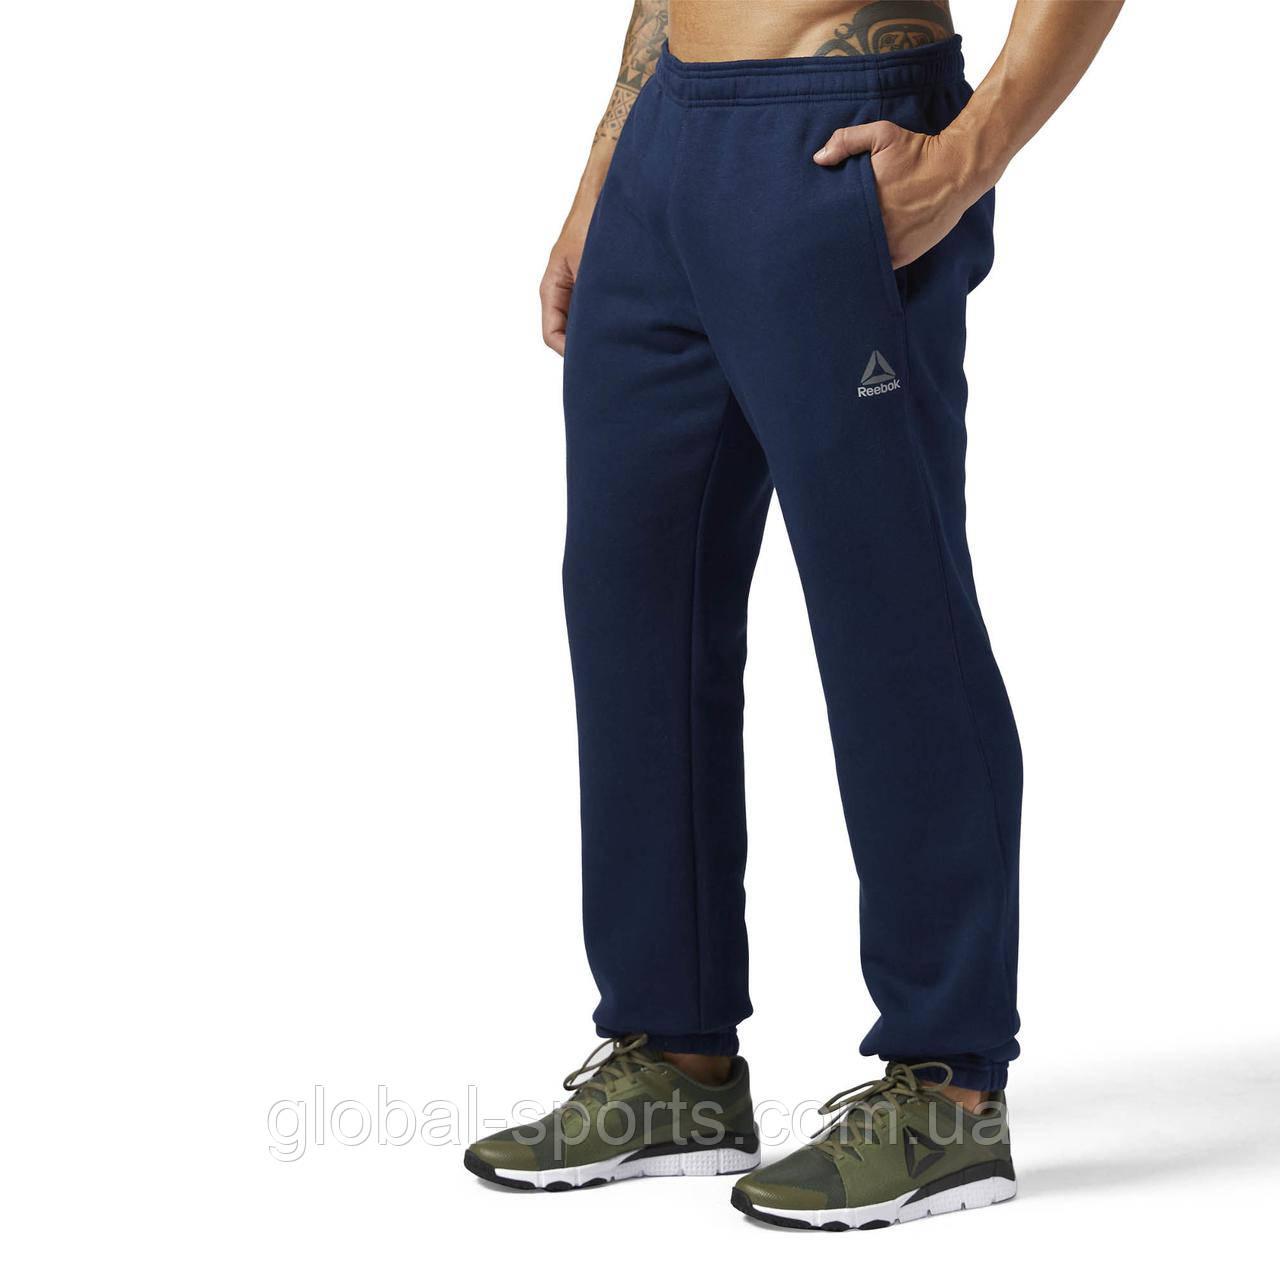 Мужские спортивные штаны Reebok Elements Cuffed Fleece(АРТИКУЛ:BK4981)